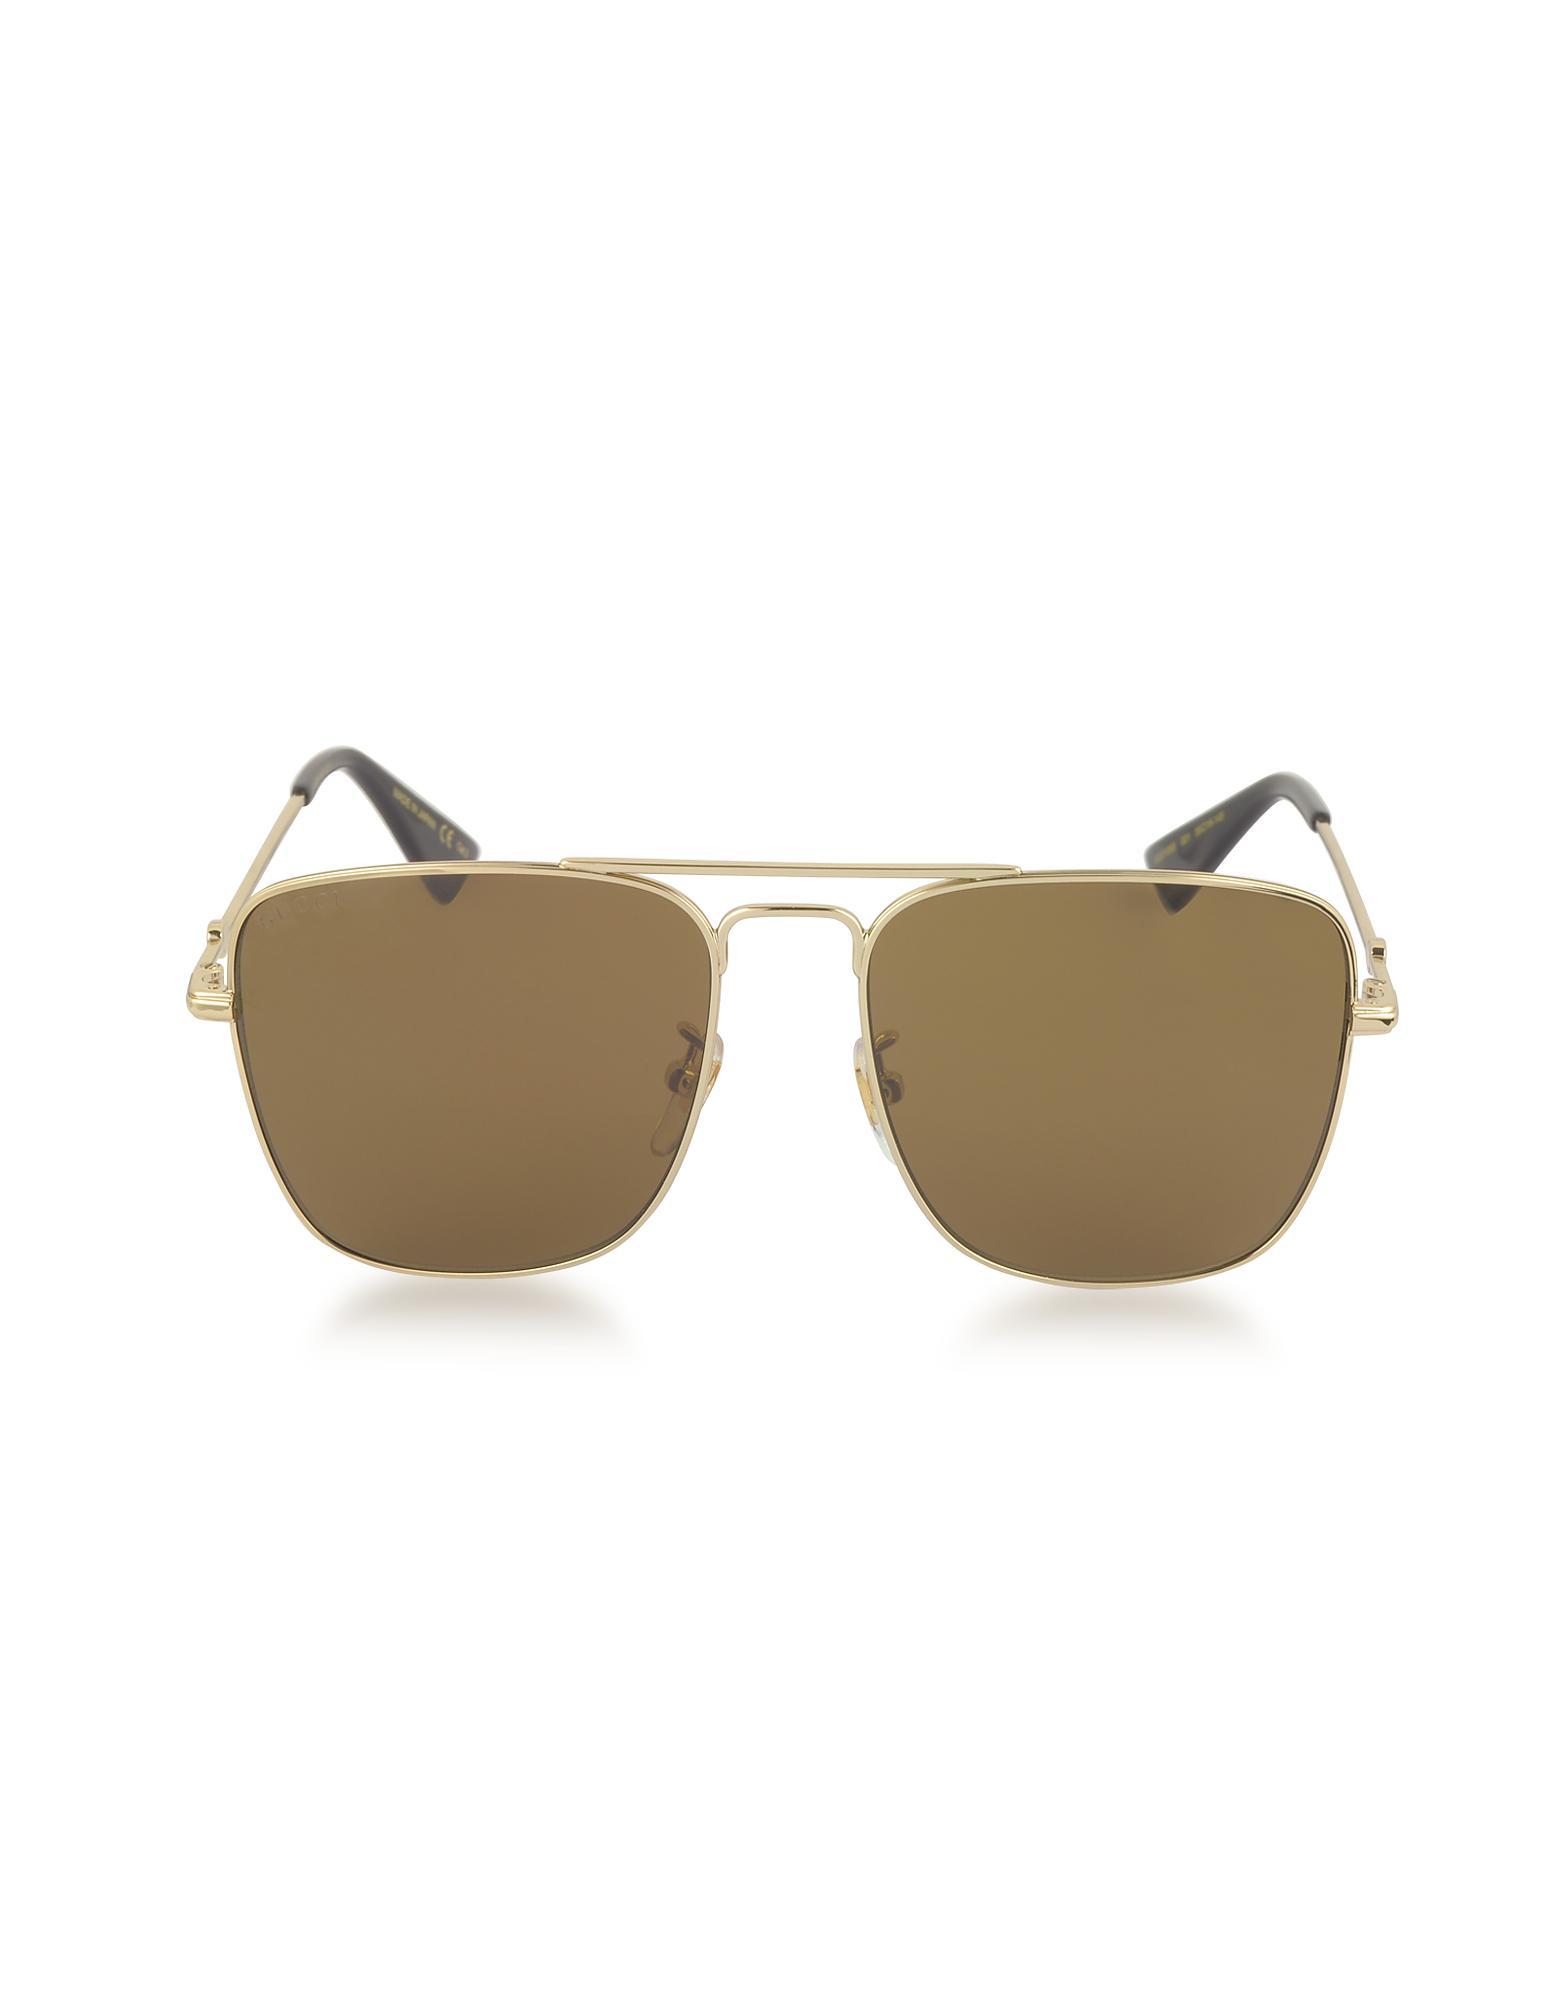 Lyst - Gucci GG0108S Gold Metal Square Aviator Men s Sunglasses in ... 1185fbacab